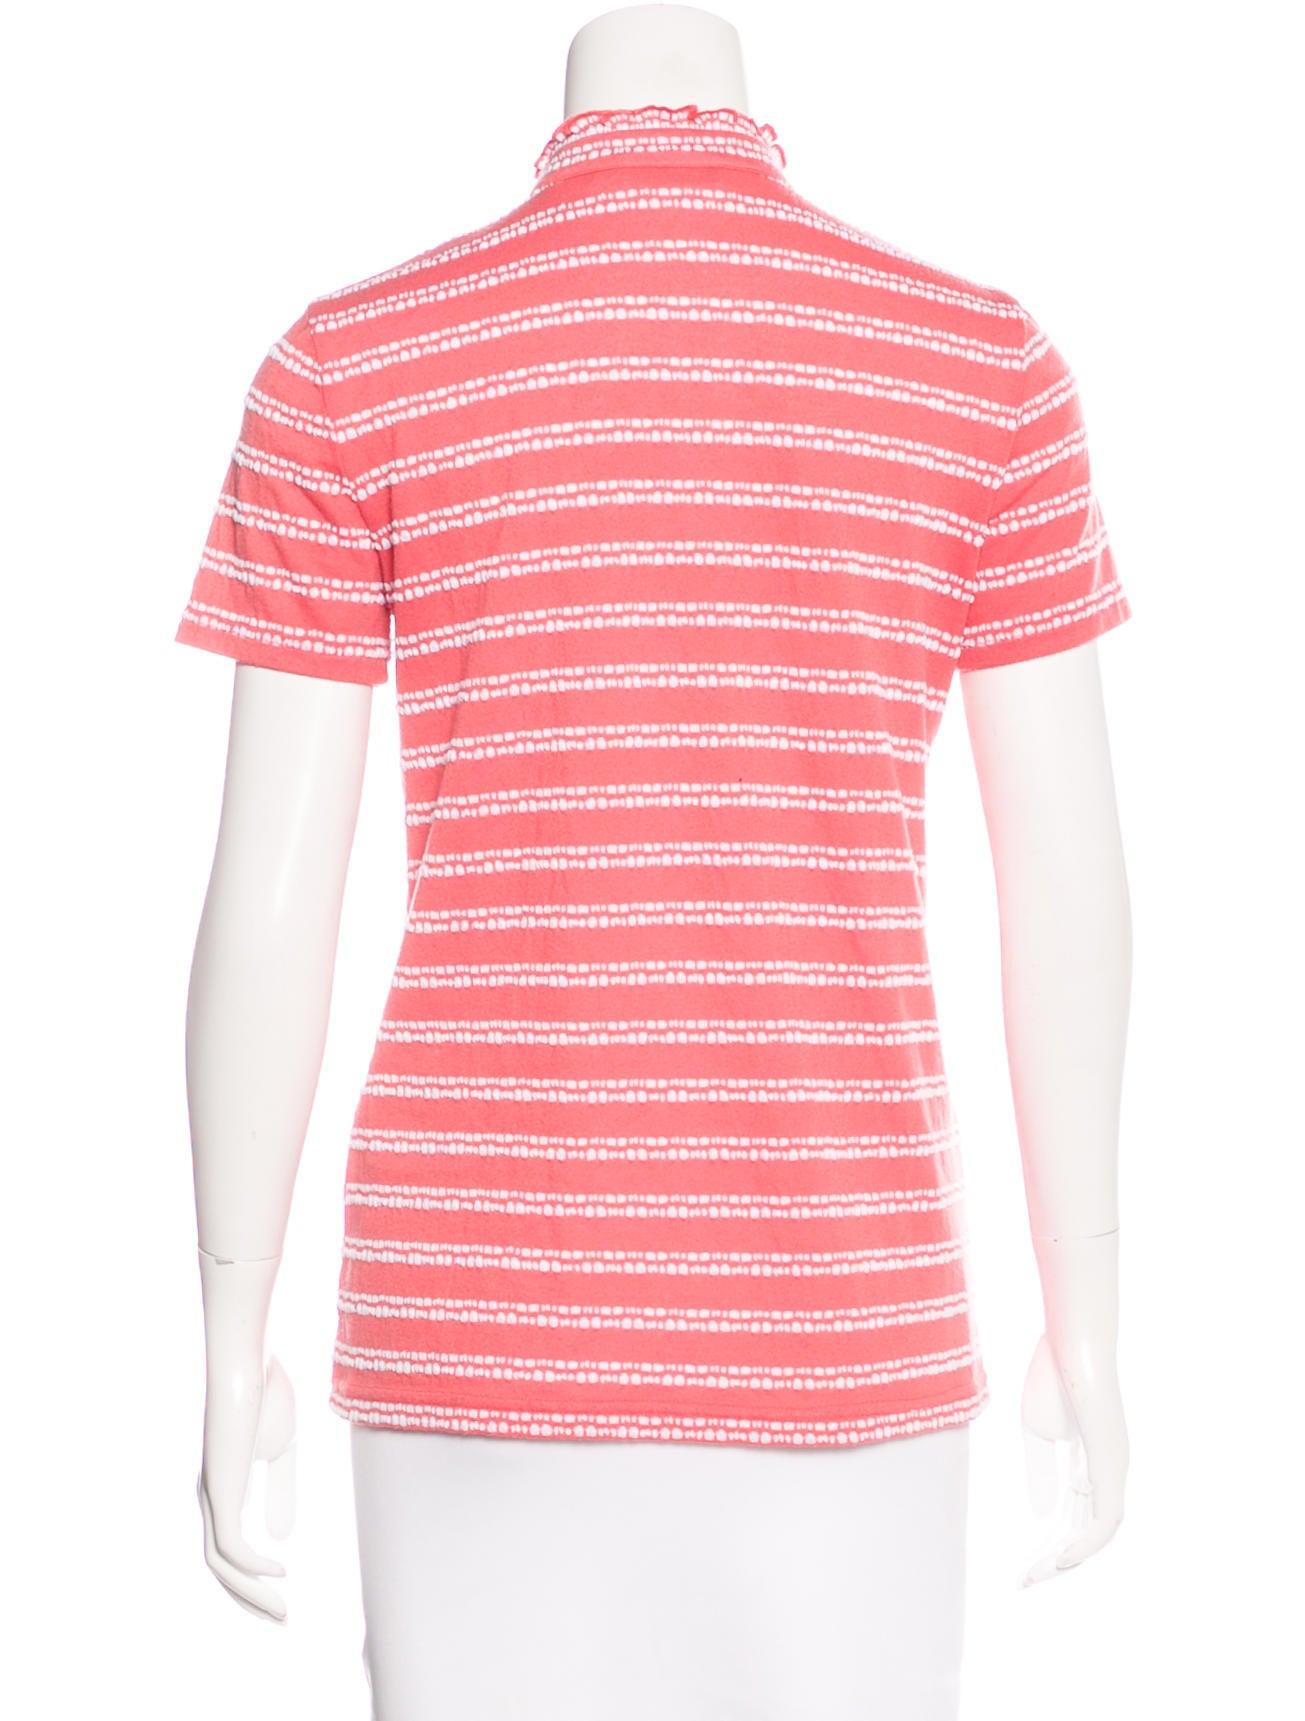 Tory Burch Ruffle Trimmed T Shirt Tops Wto91617 The